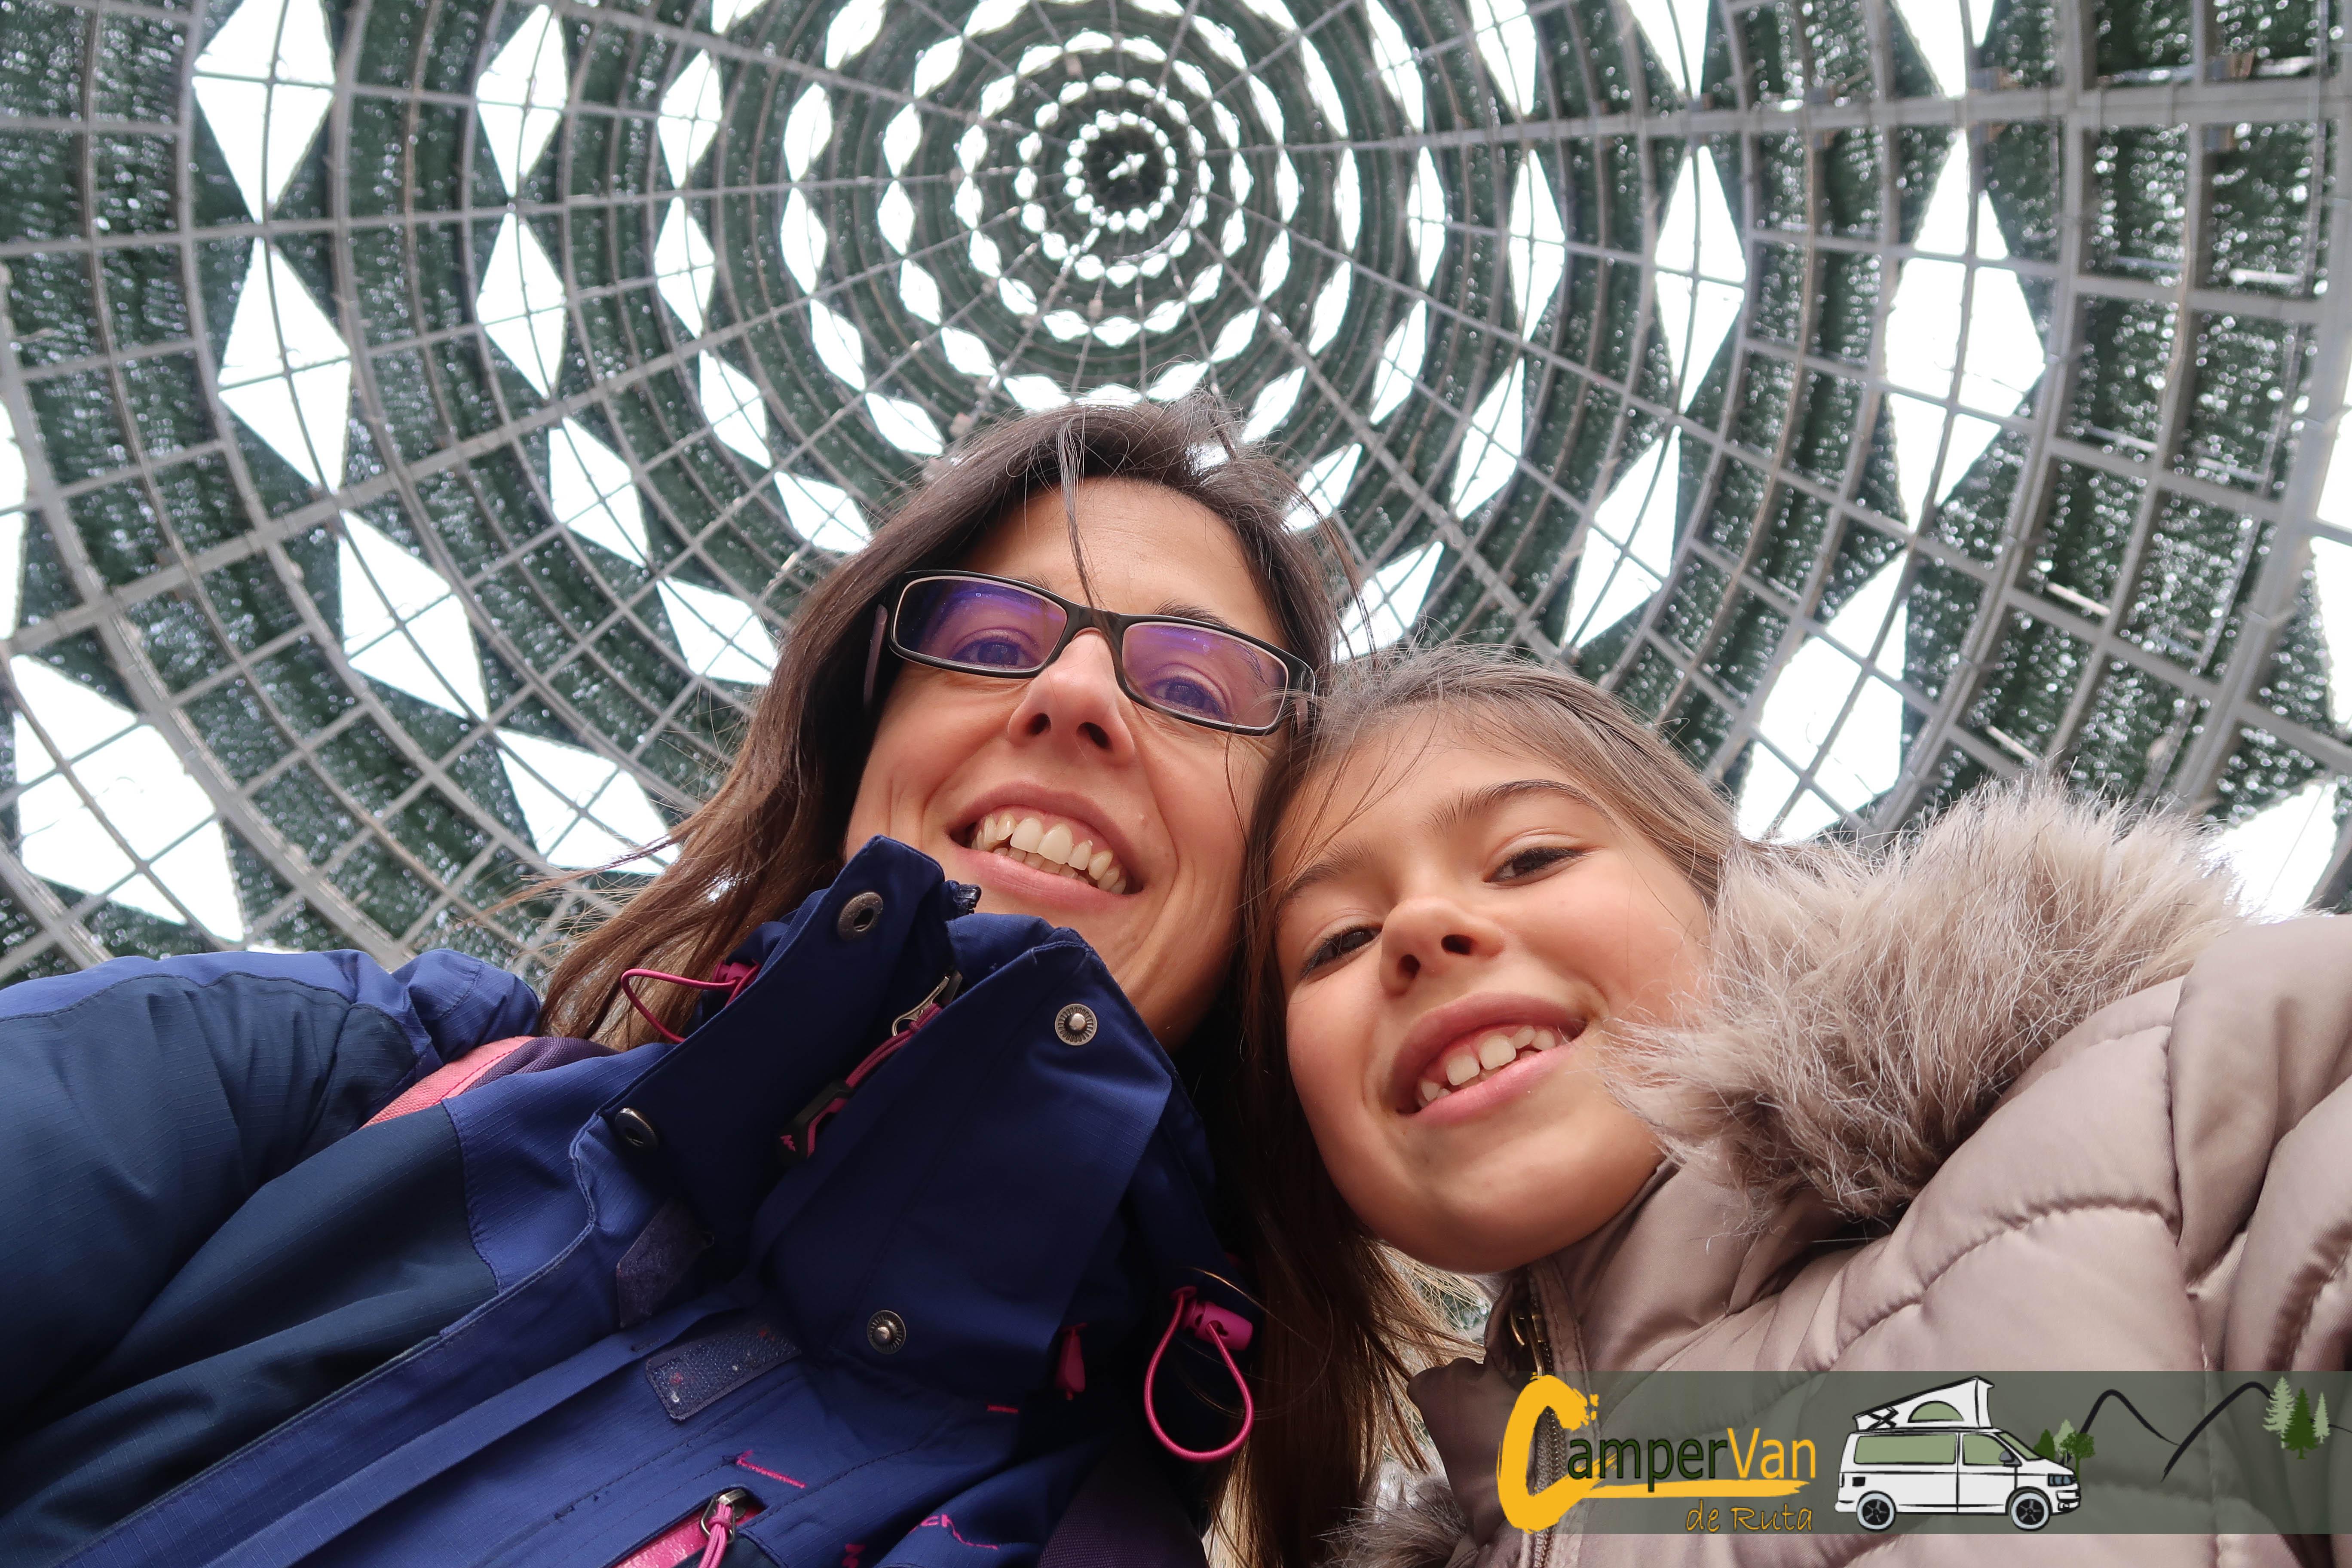 Campervan de Ruta Noemi and Nuria under a dome